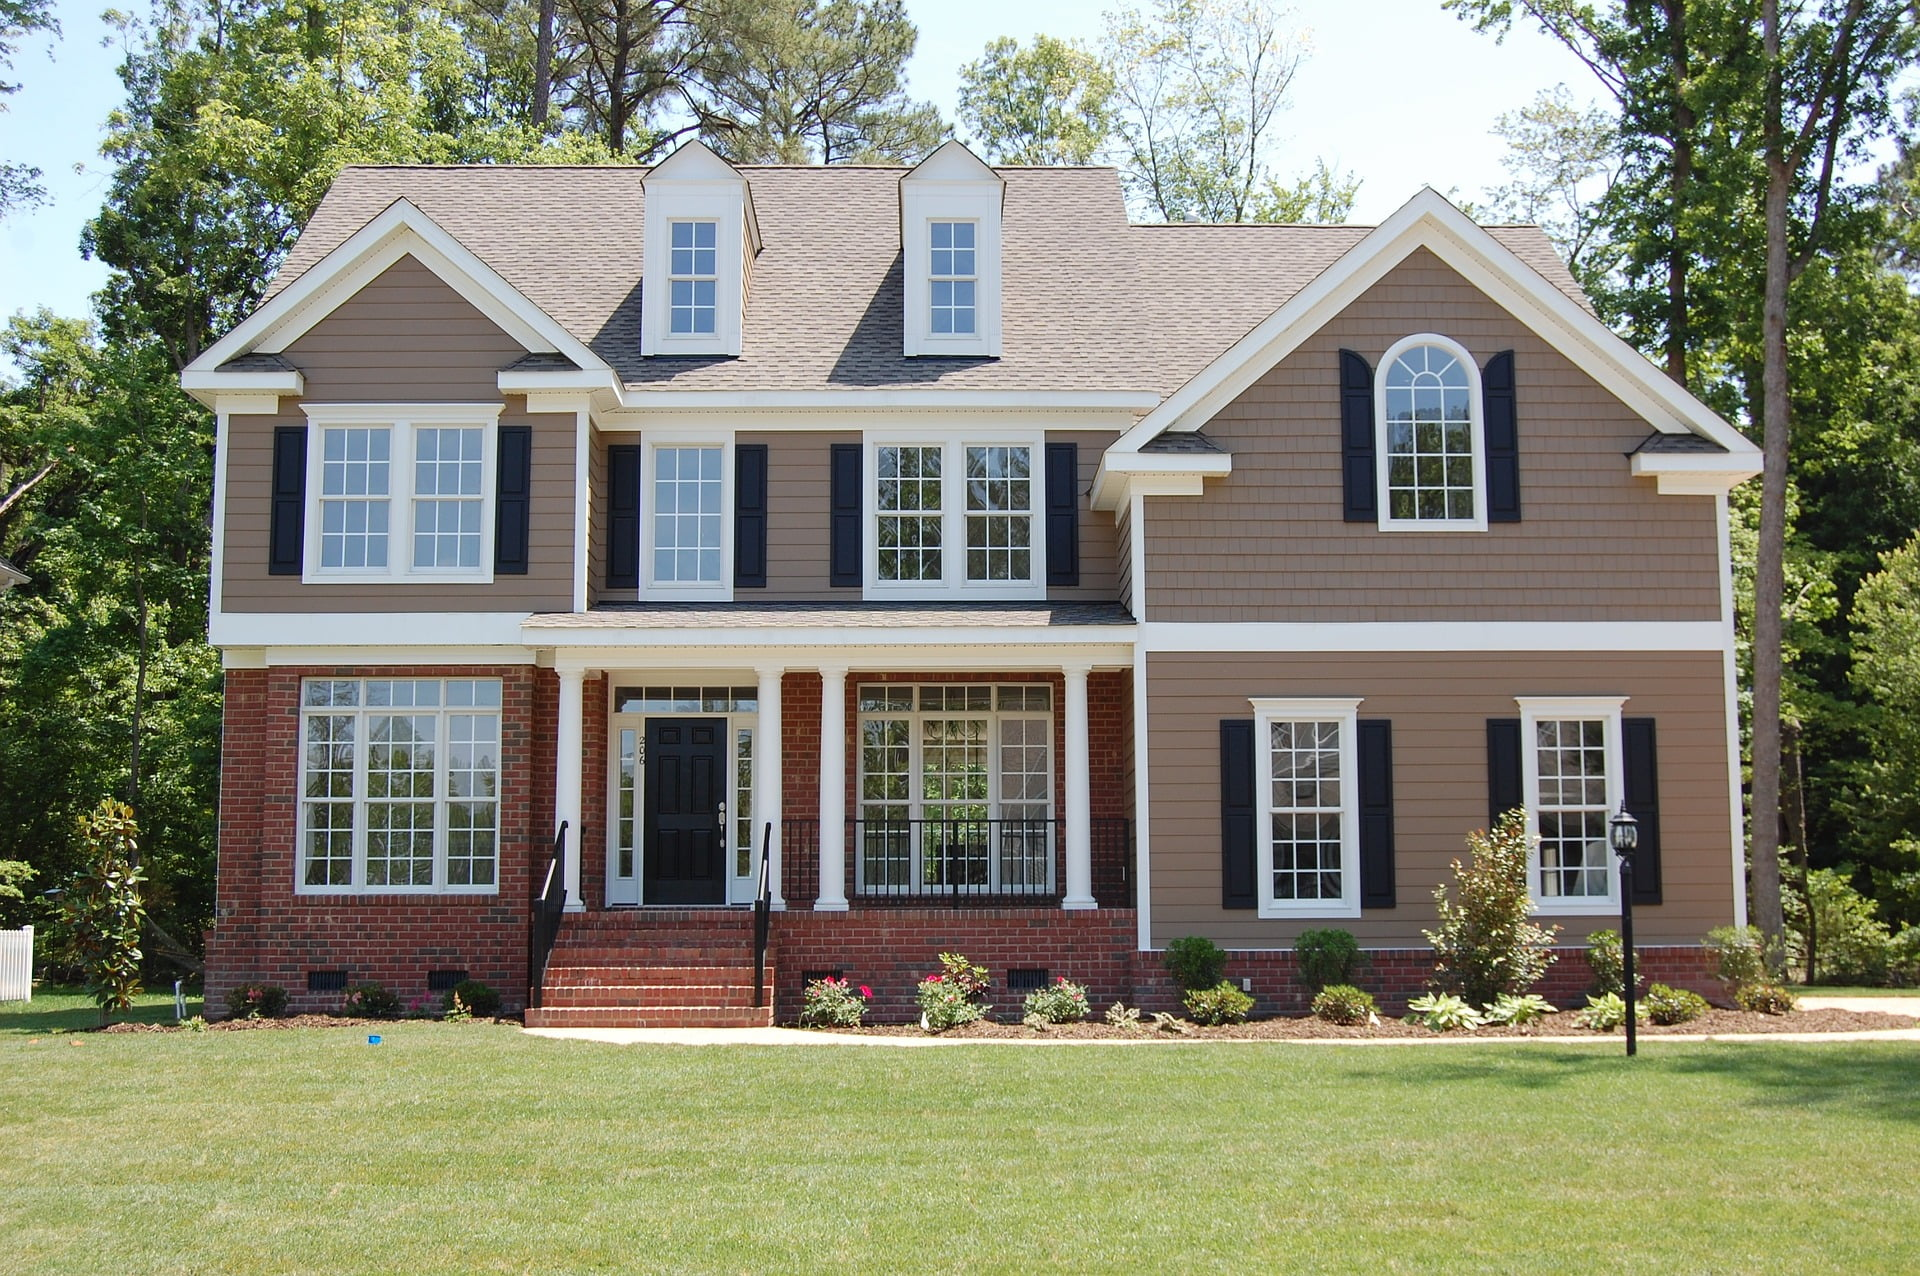 Fix or flip home loans